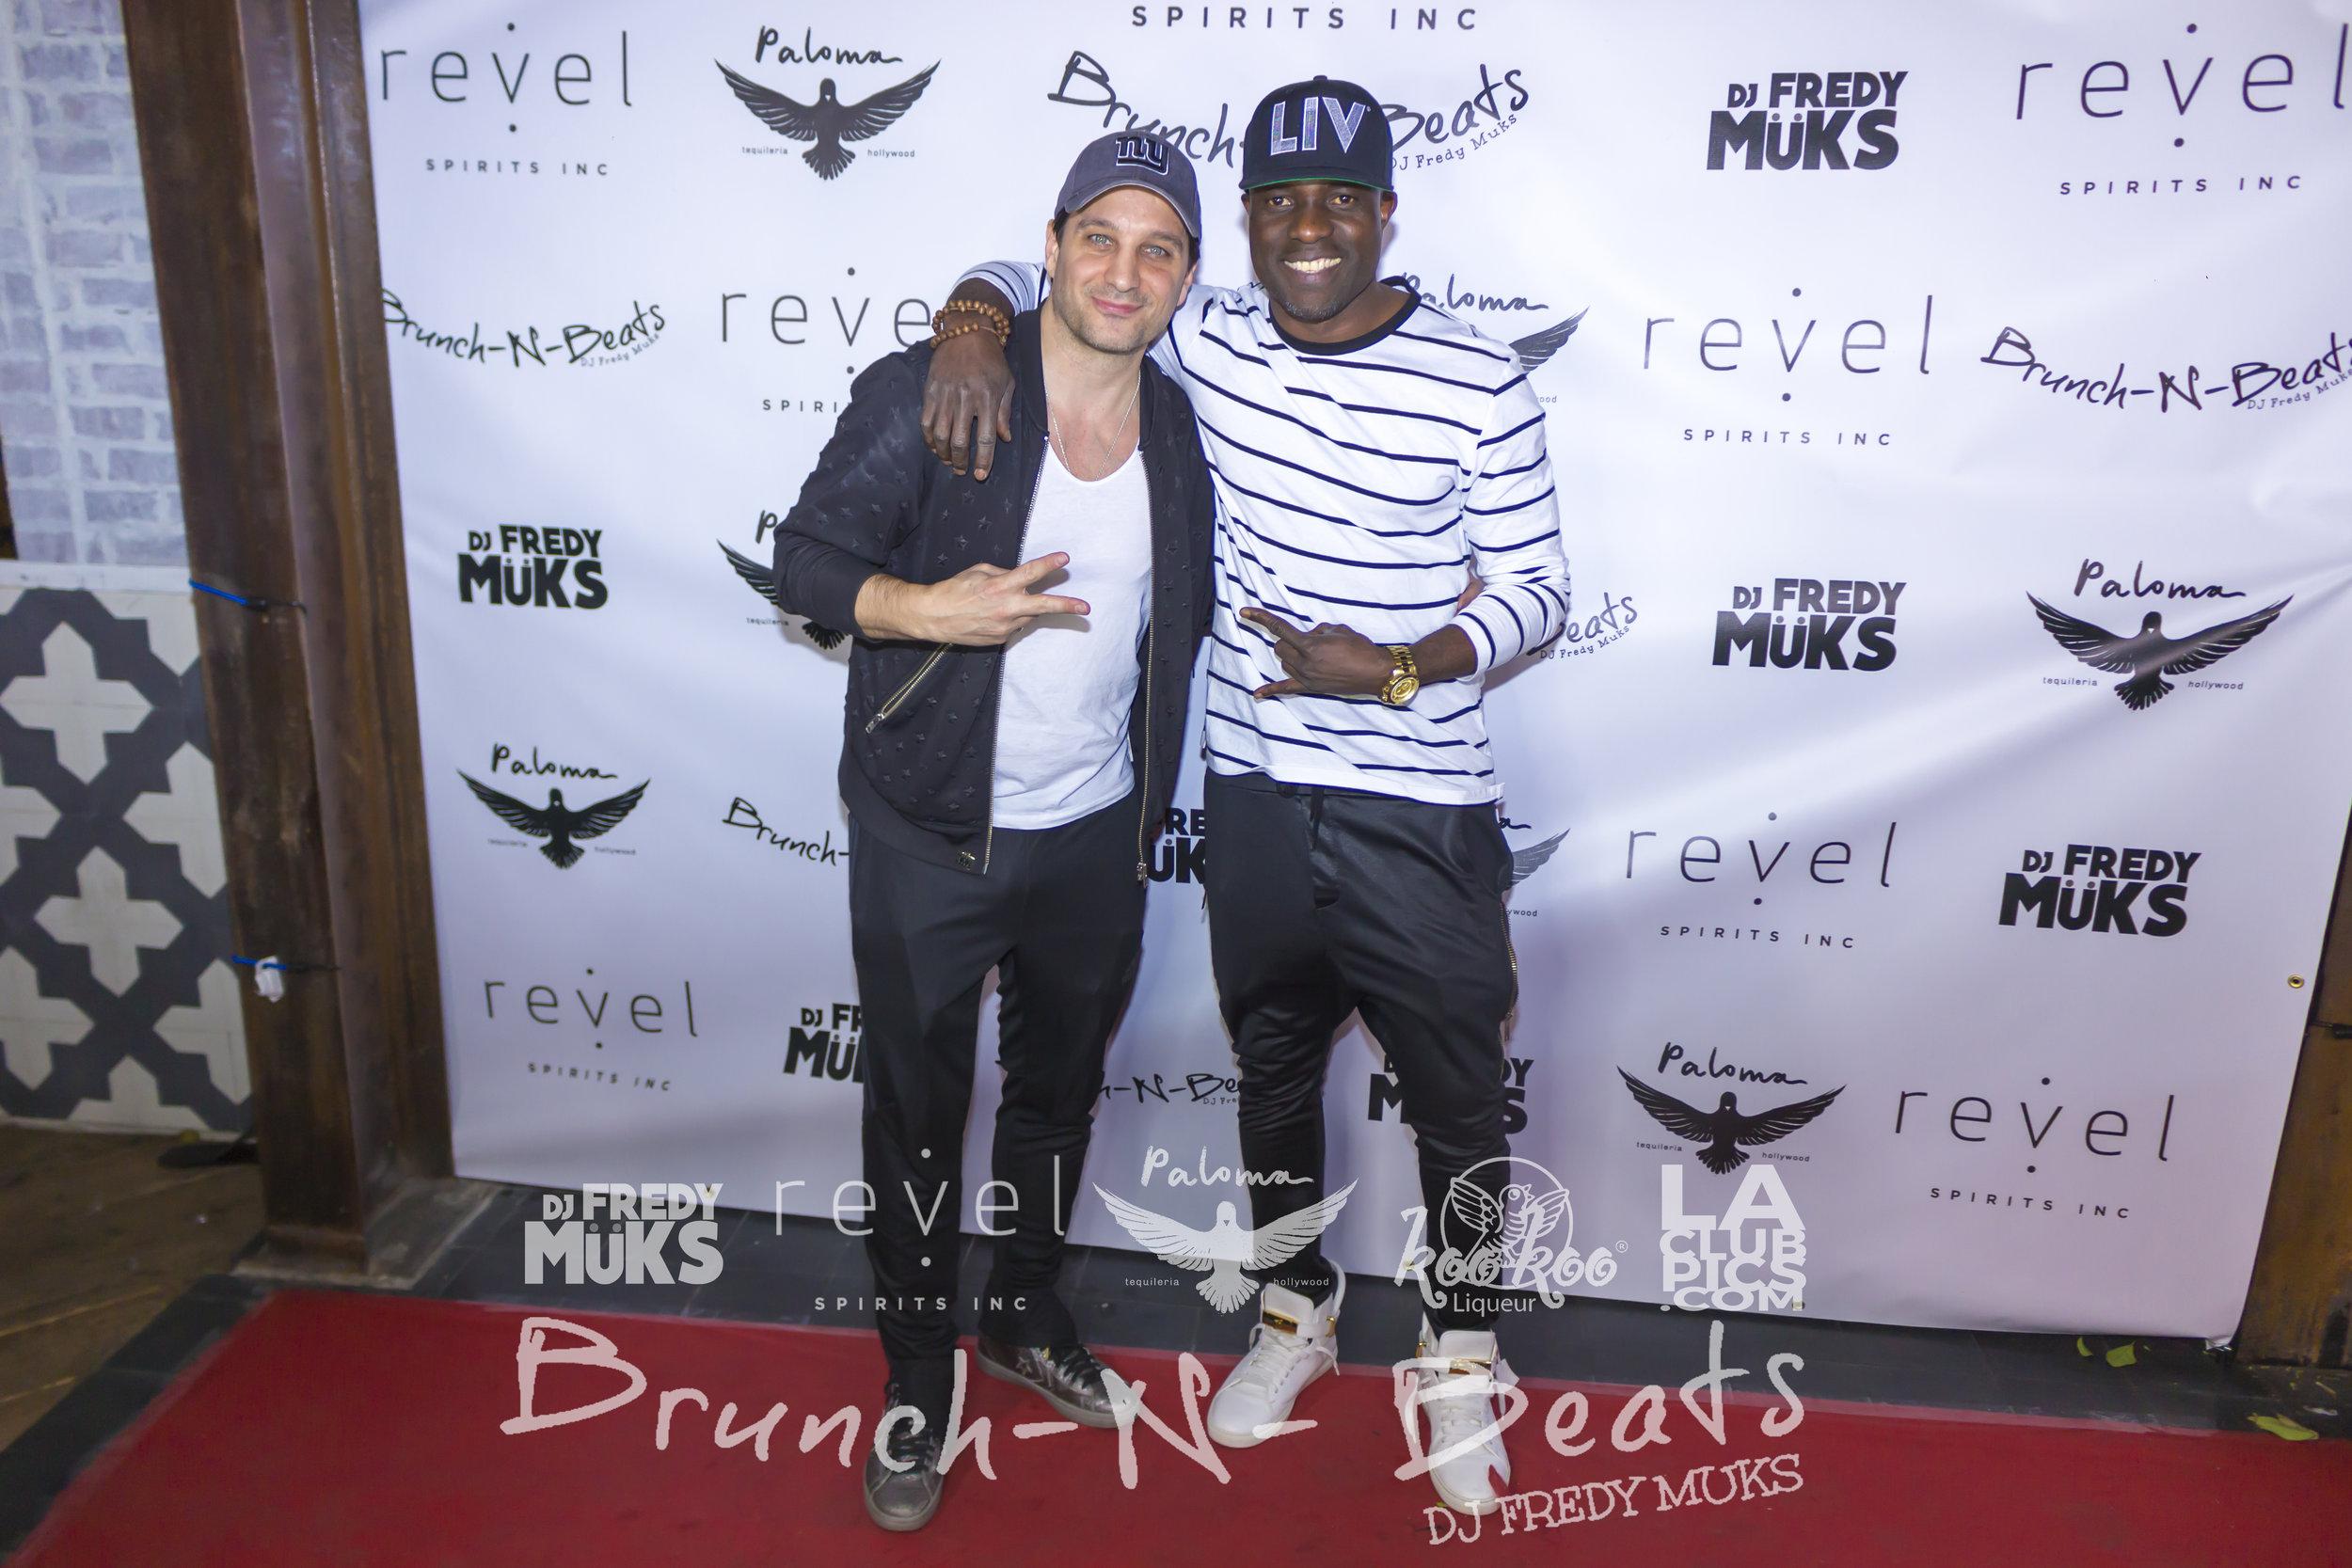 Brunch-N-Beats - Paloma Hollywood - 02-25-18_171.jpg